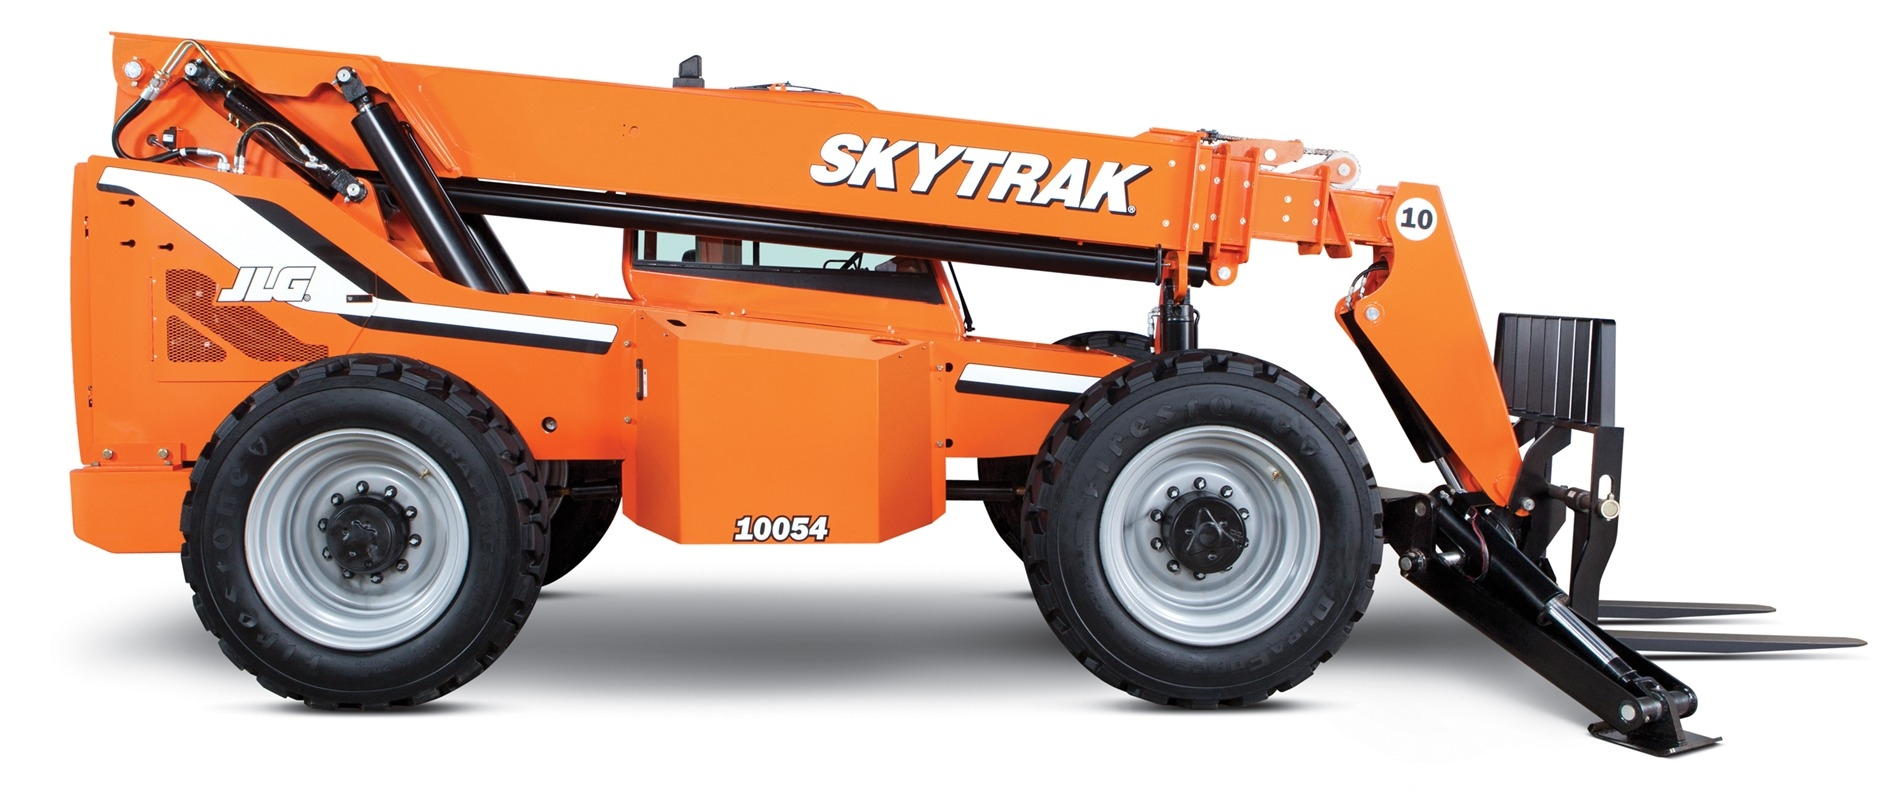 Onde Encontrar Venda de Manipulador Skytrak na Vila Mariana - Fornecedor de Manipuladores